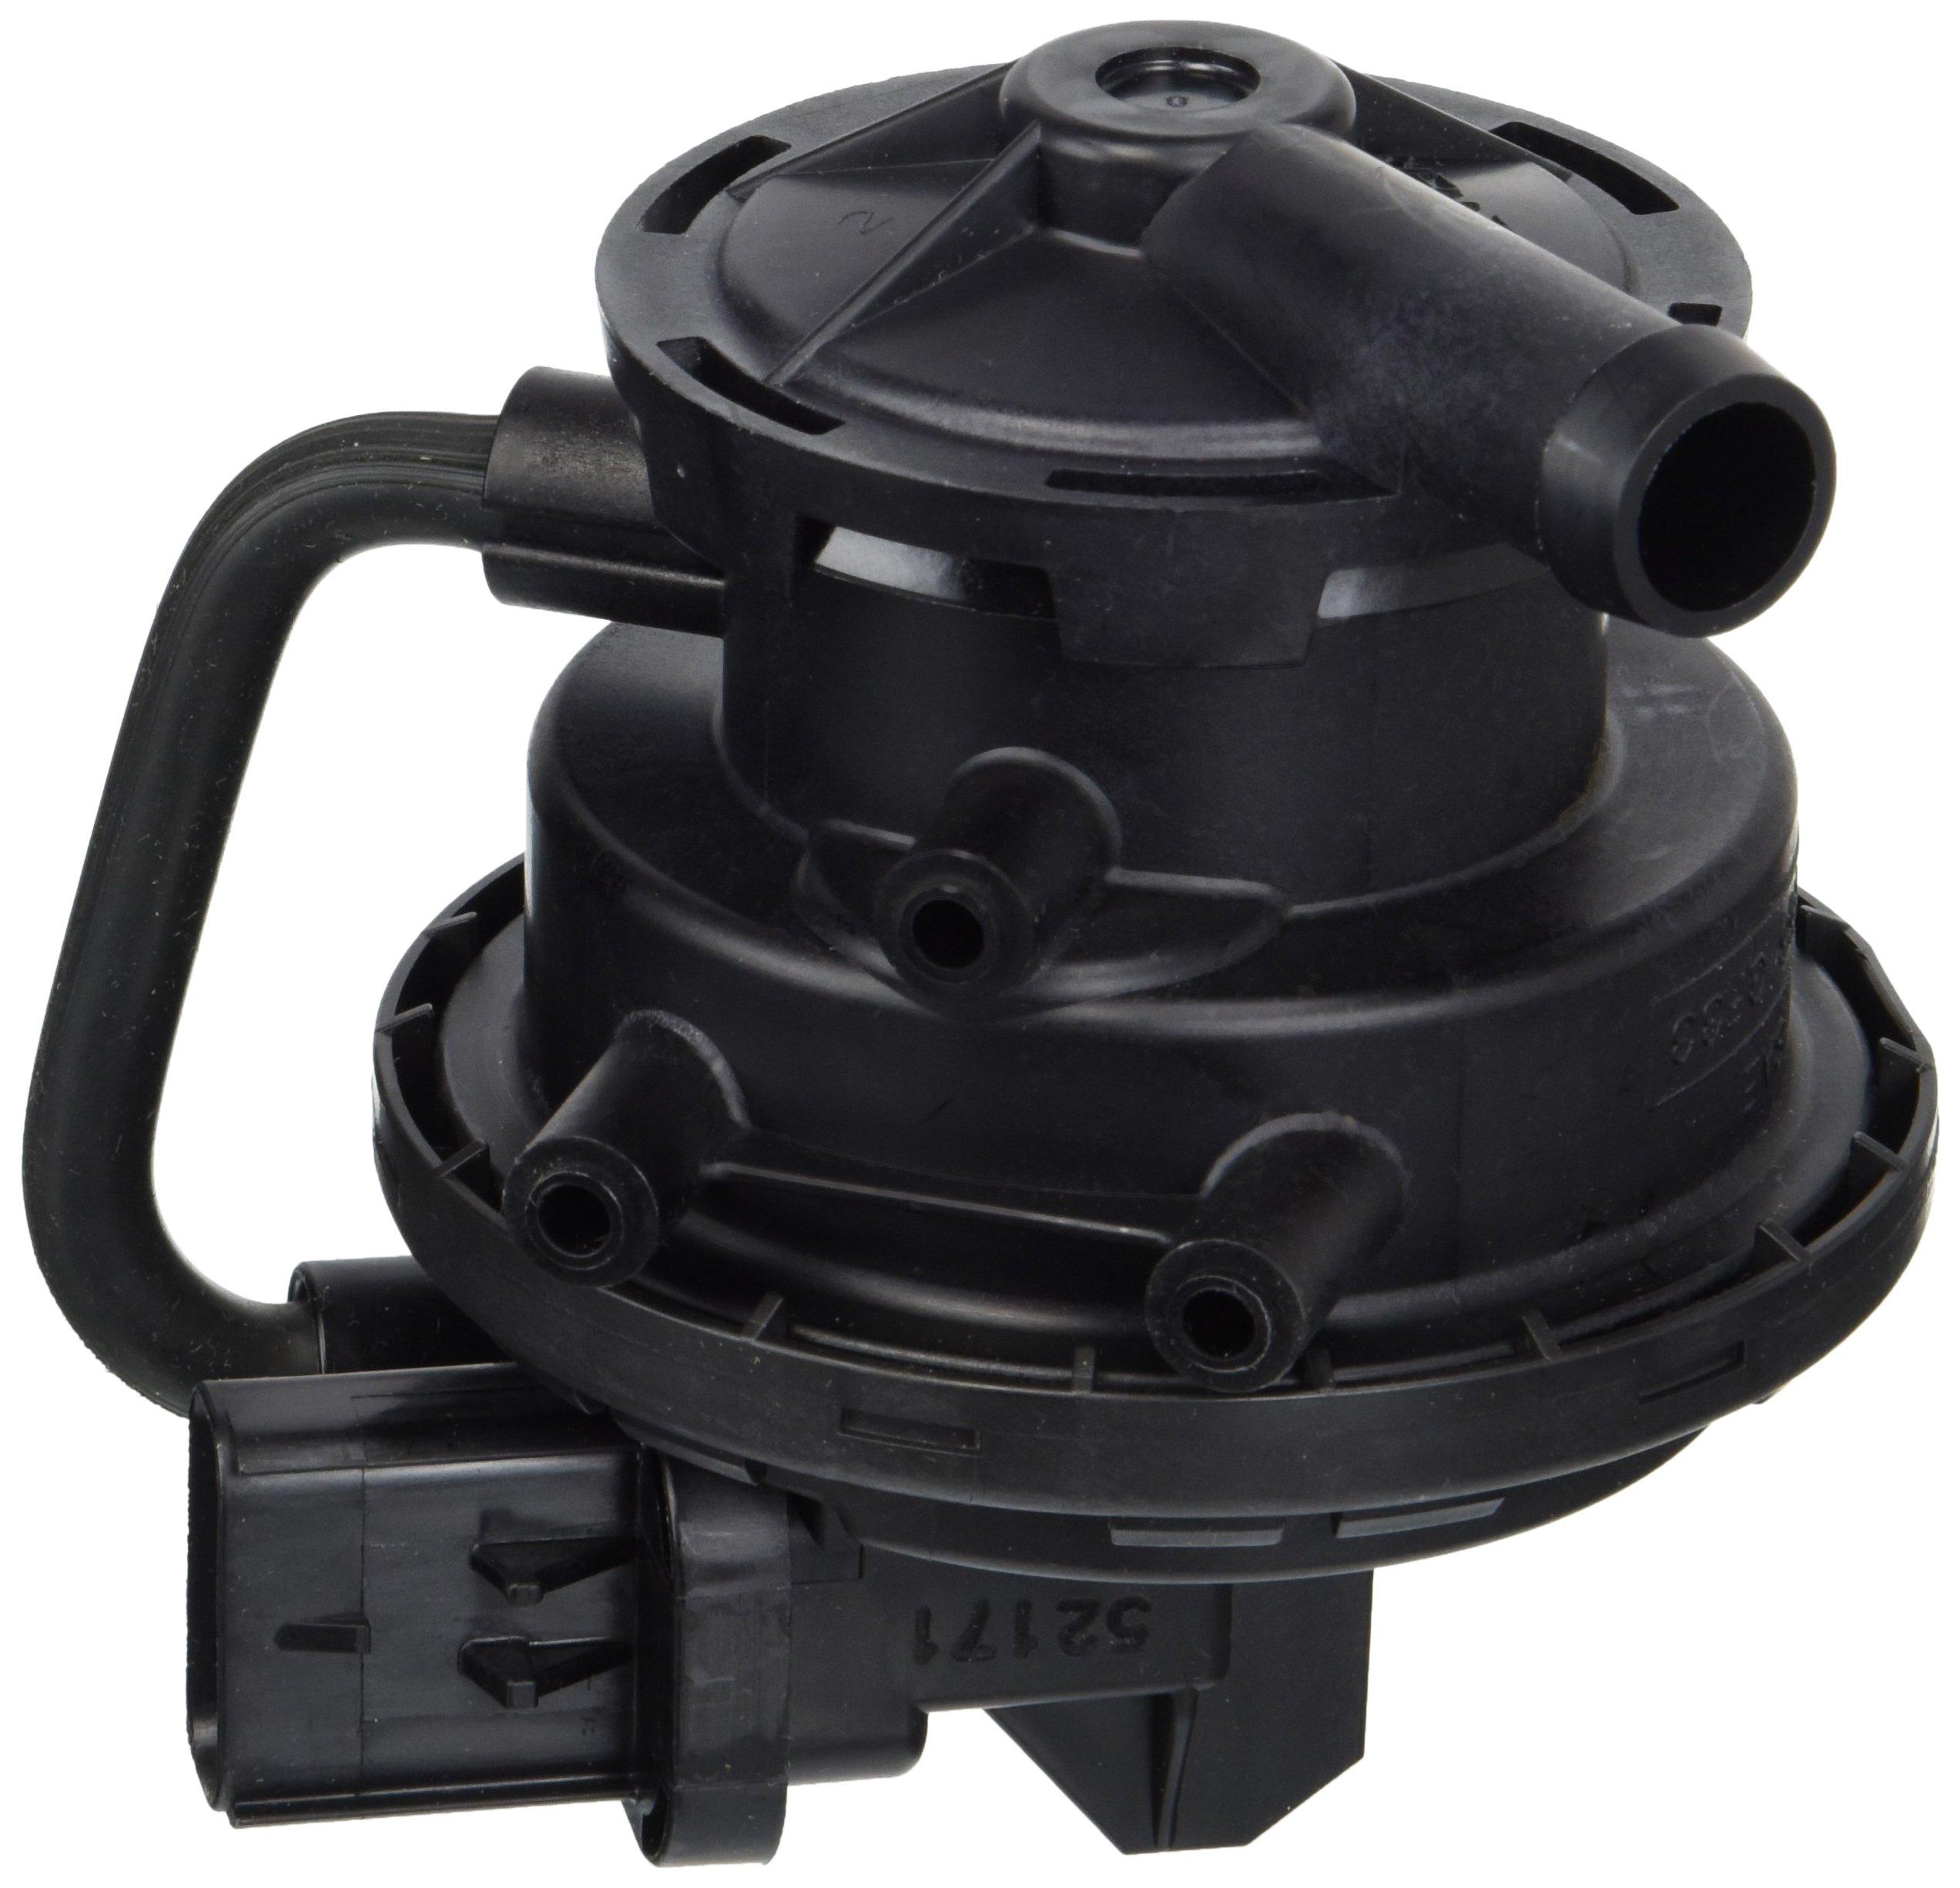 Chrysler Genuine 4891422AD Fuel Leak Detection Pump by Chrysler (Image #2)